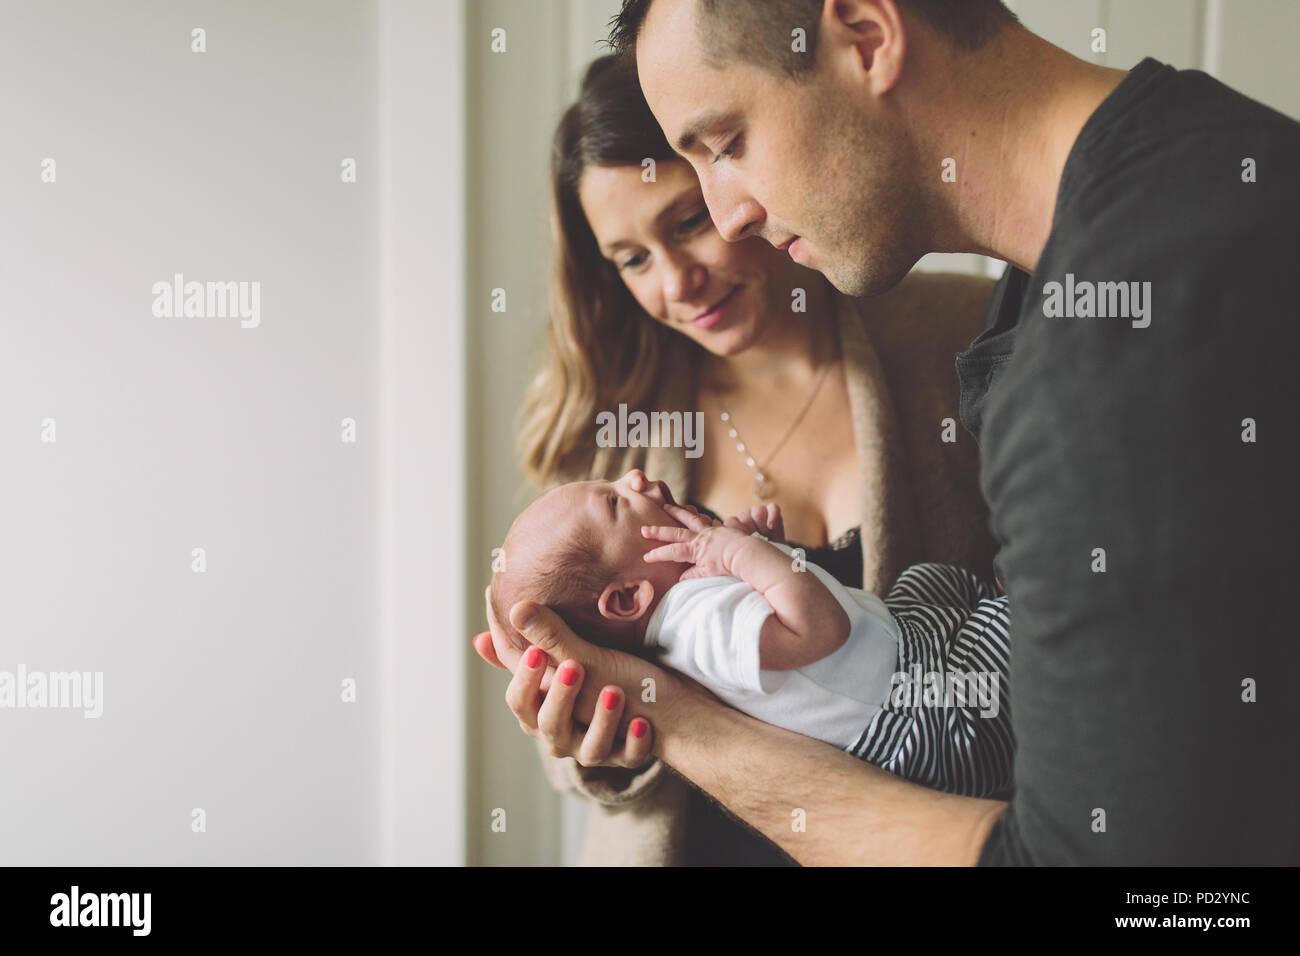 New parents admiring new born baby boy - Stock Image